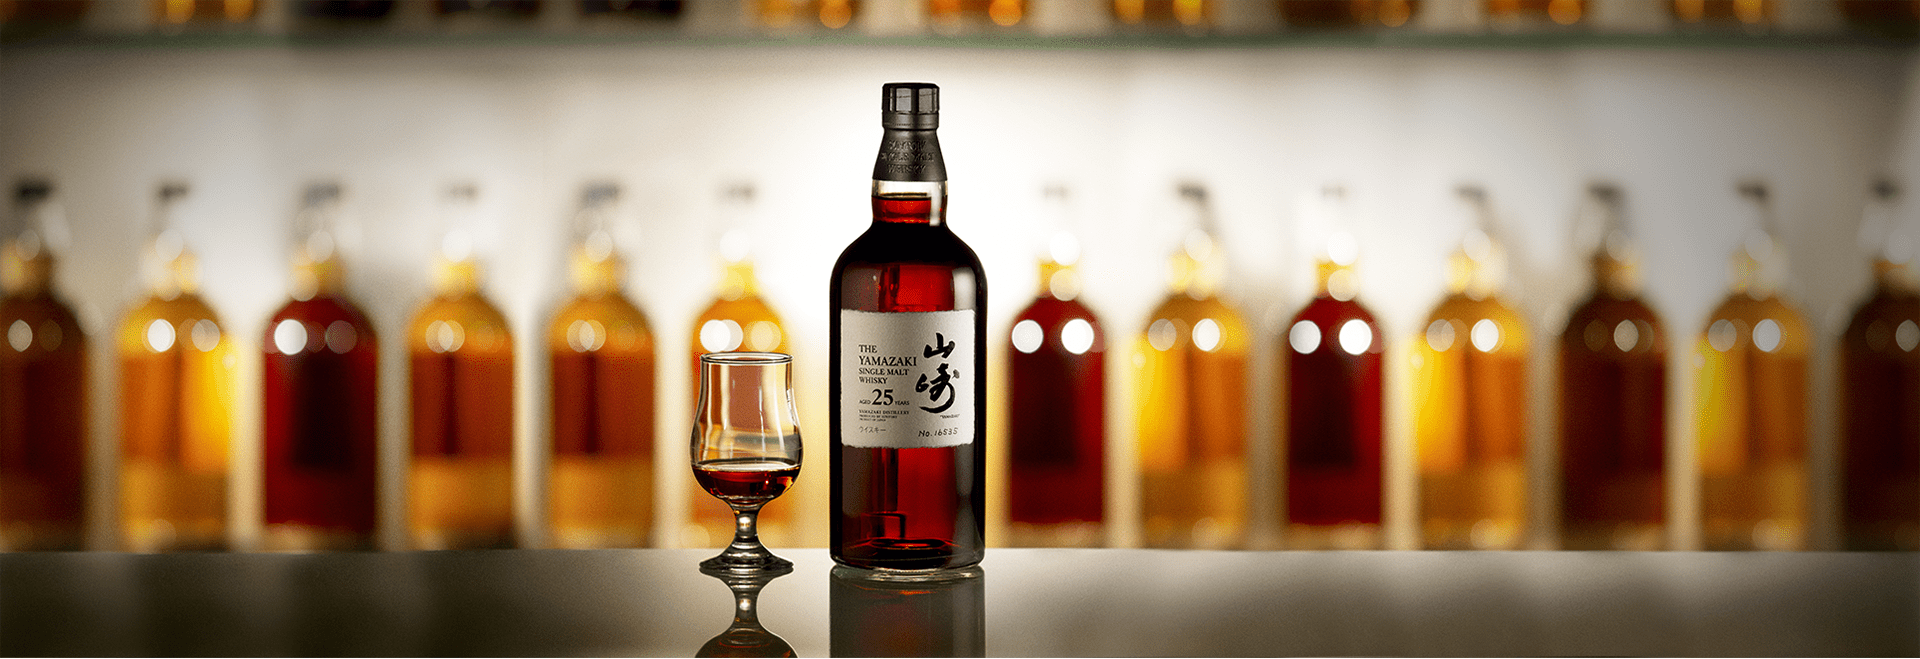 Yamazaki-Mizunara-whisky-japones-TheLuxuryTrends